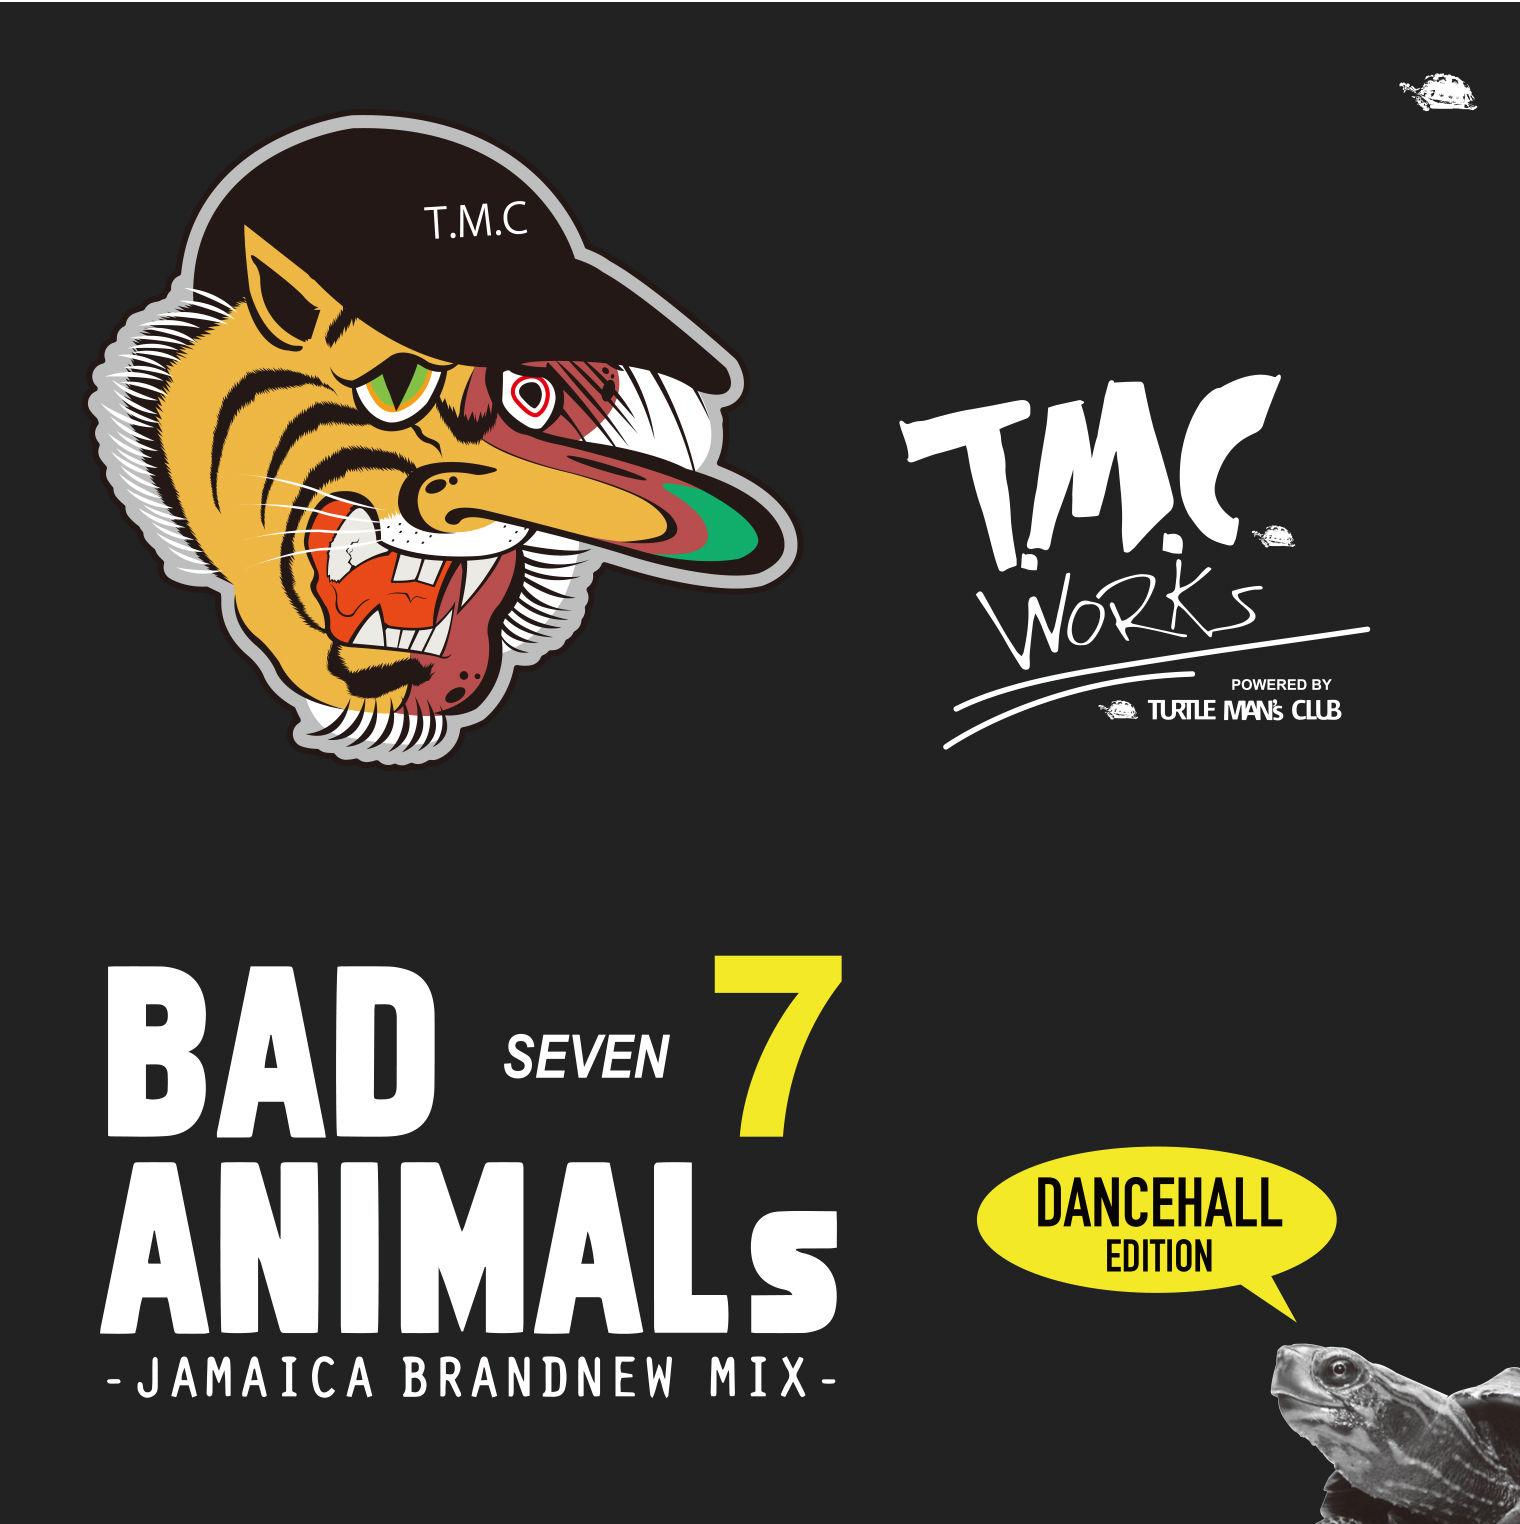 T.M.C WORKS(TURTLE MAN's CLUB) / BAD ANIMALS 7 -JAMAICA BRAND NEW MIX-